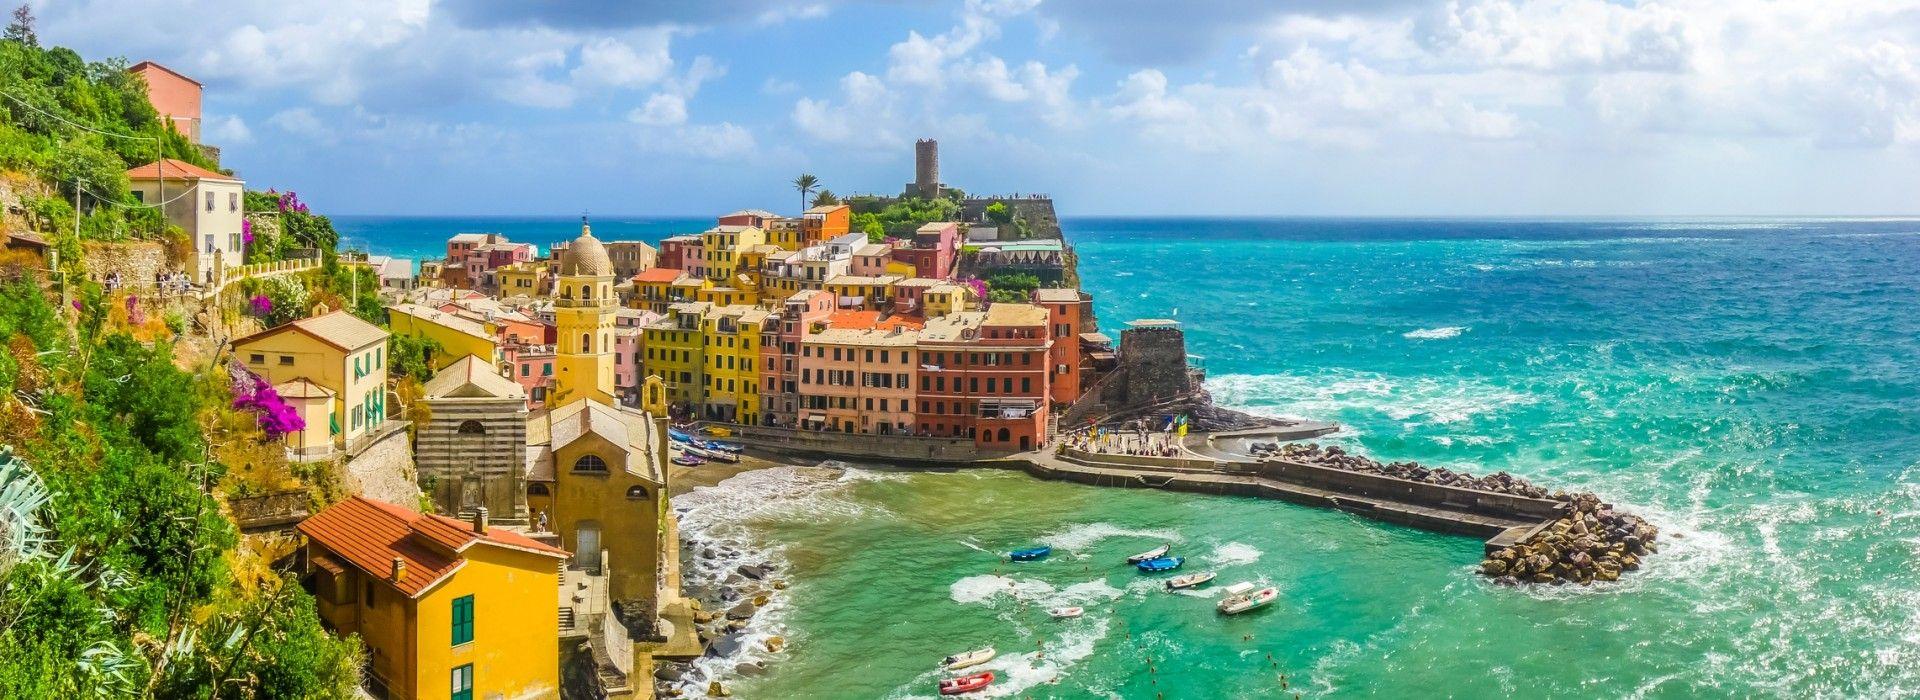 Adventure and sport Tours in Cinque Terre and Liguria